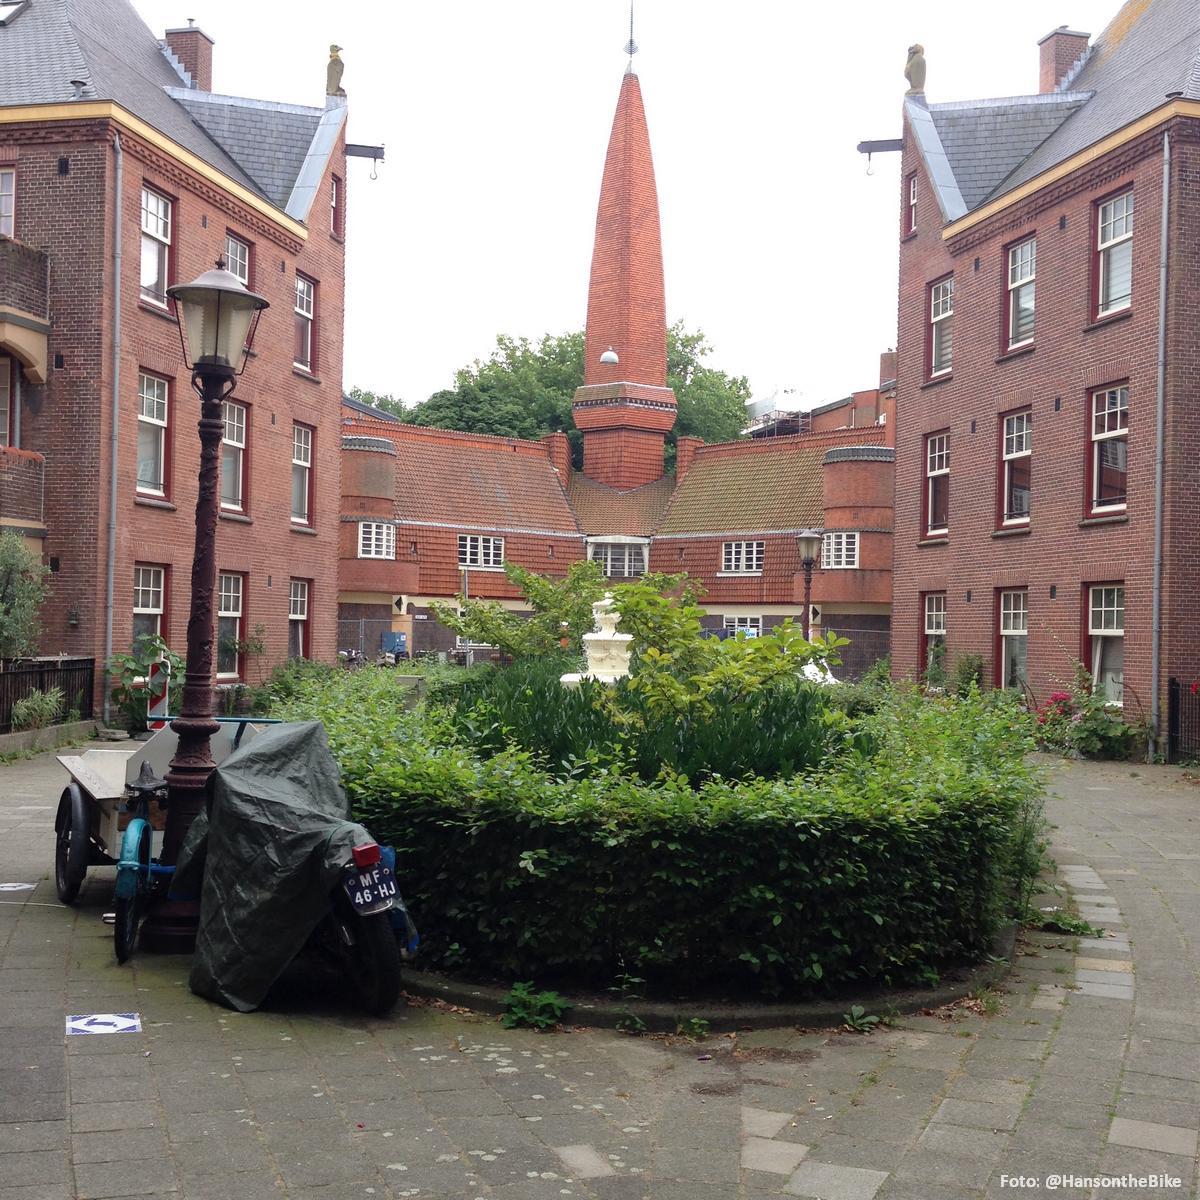 amsterdam-hansonthebike-04